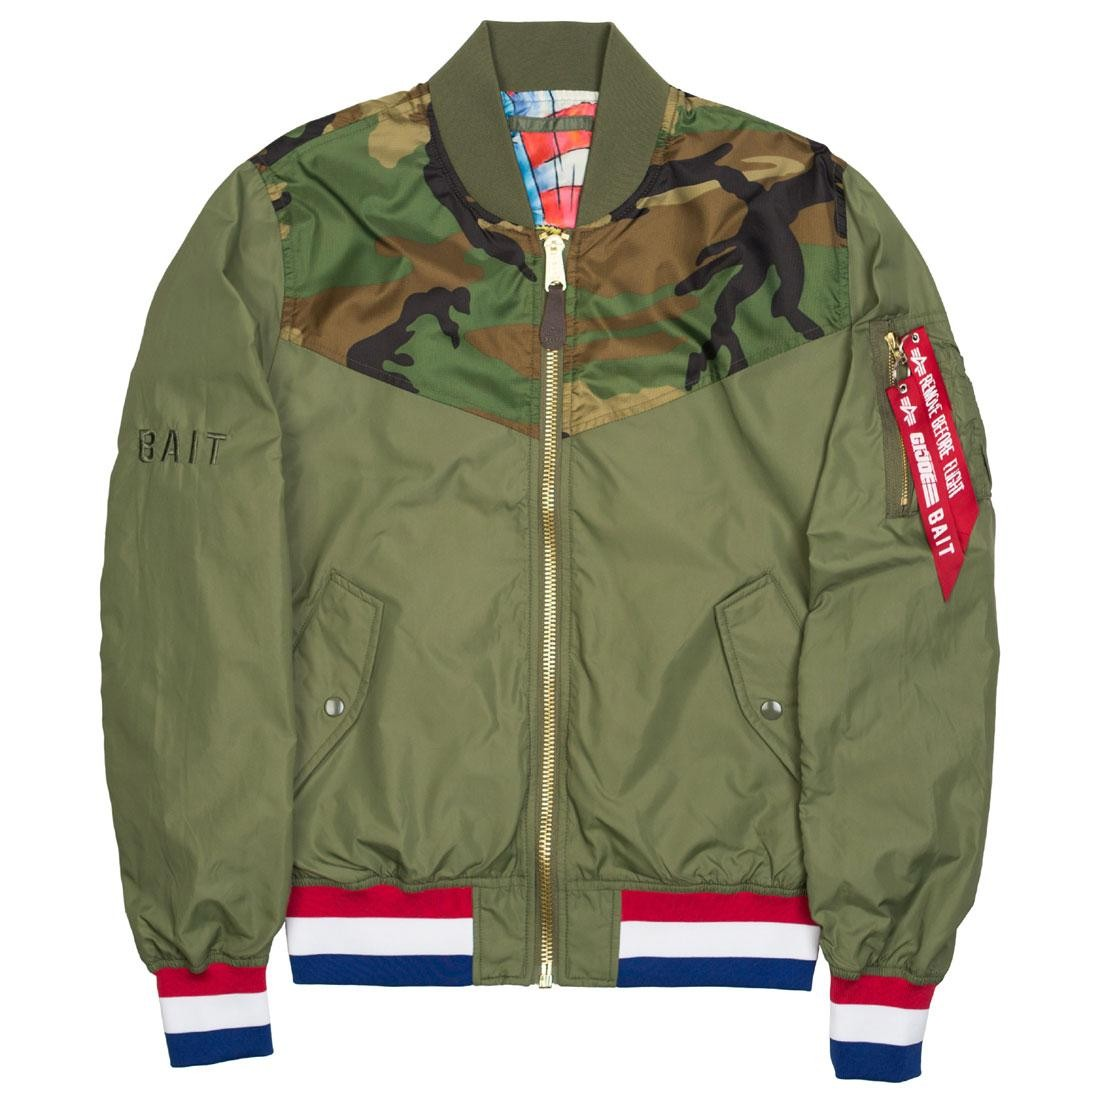 BAIT x Alpha Industries x GI JOE Men L2B Scout Military Reversible Jacket (green / olive)